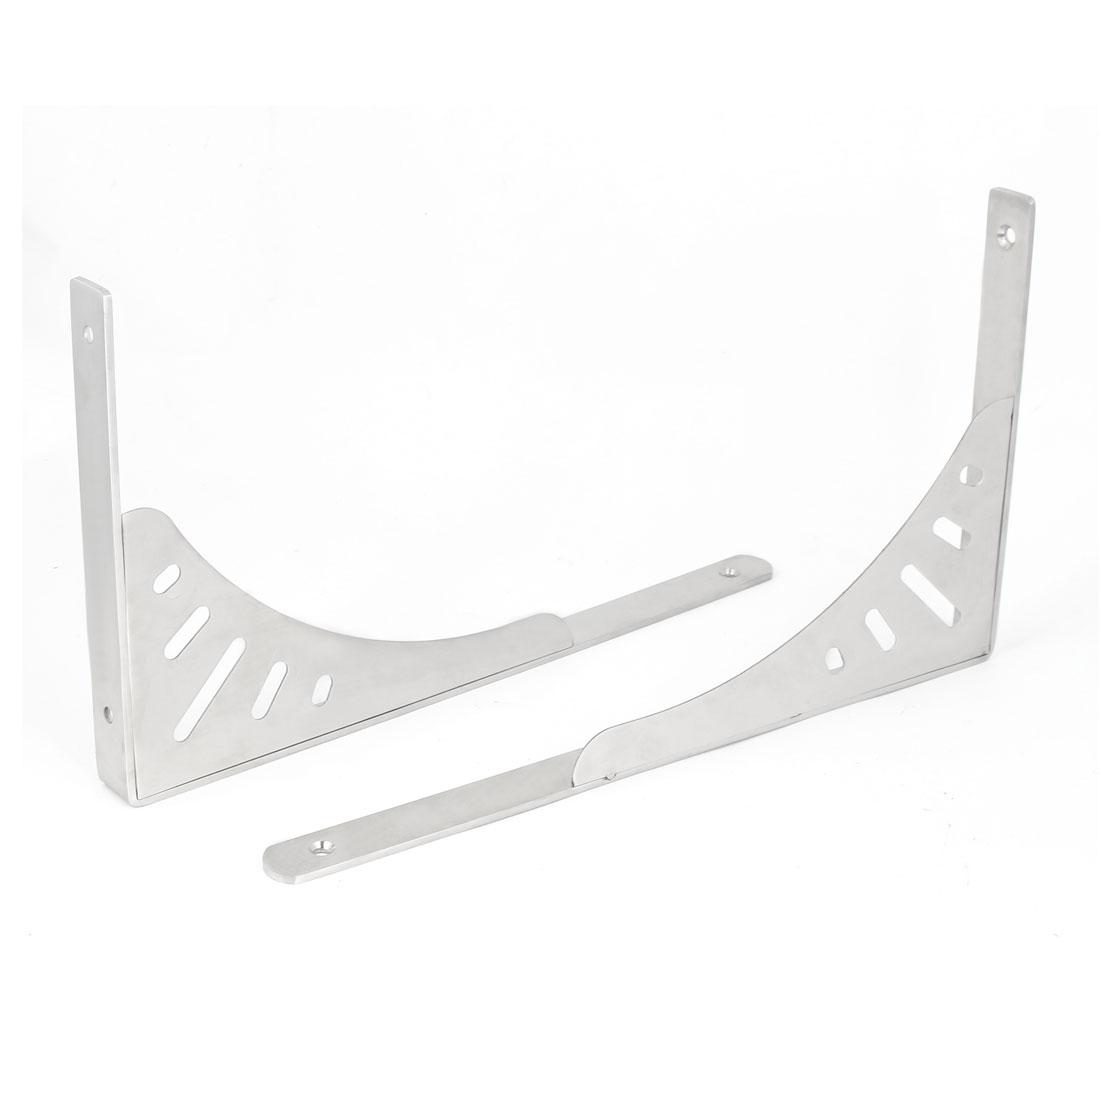 "14"" Stainless Steel L Shape Wall Mounted Shelf Bracket Brace Sliver Tone 2pcs"